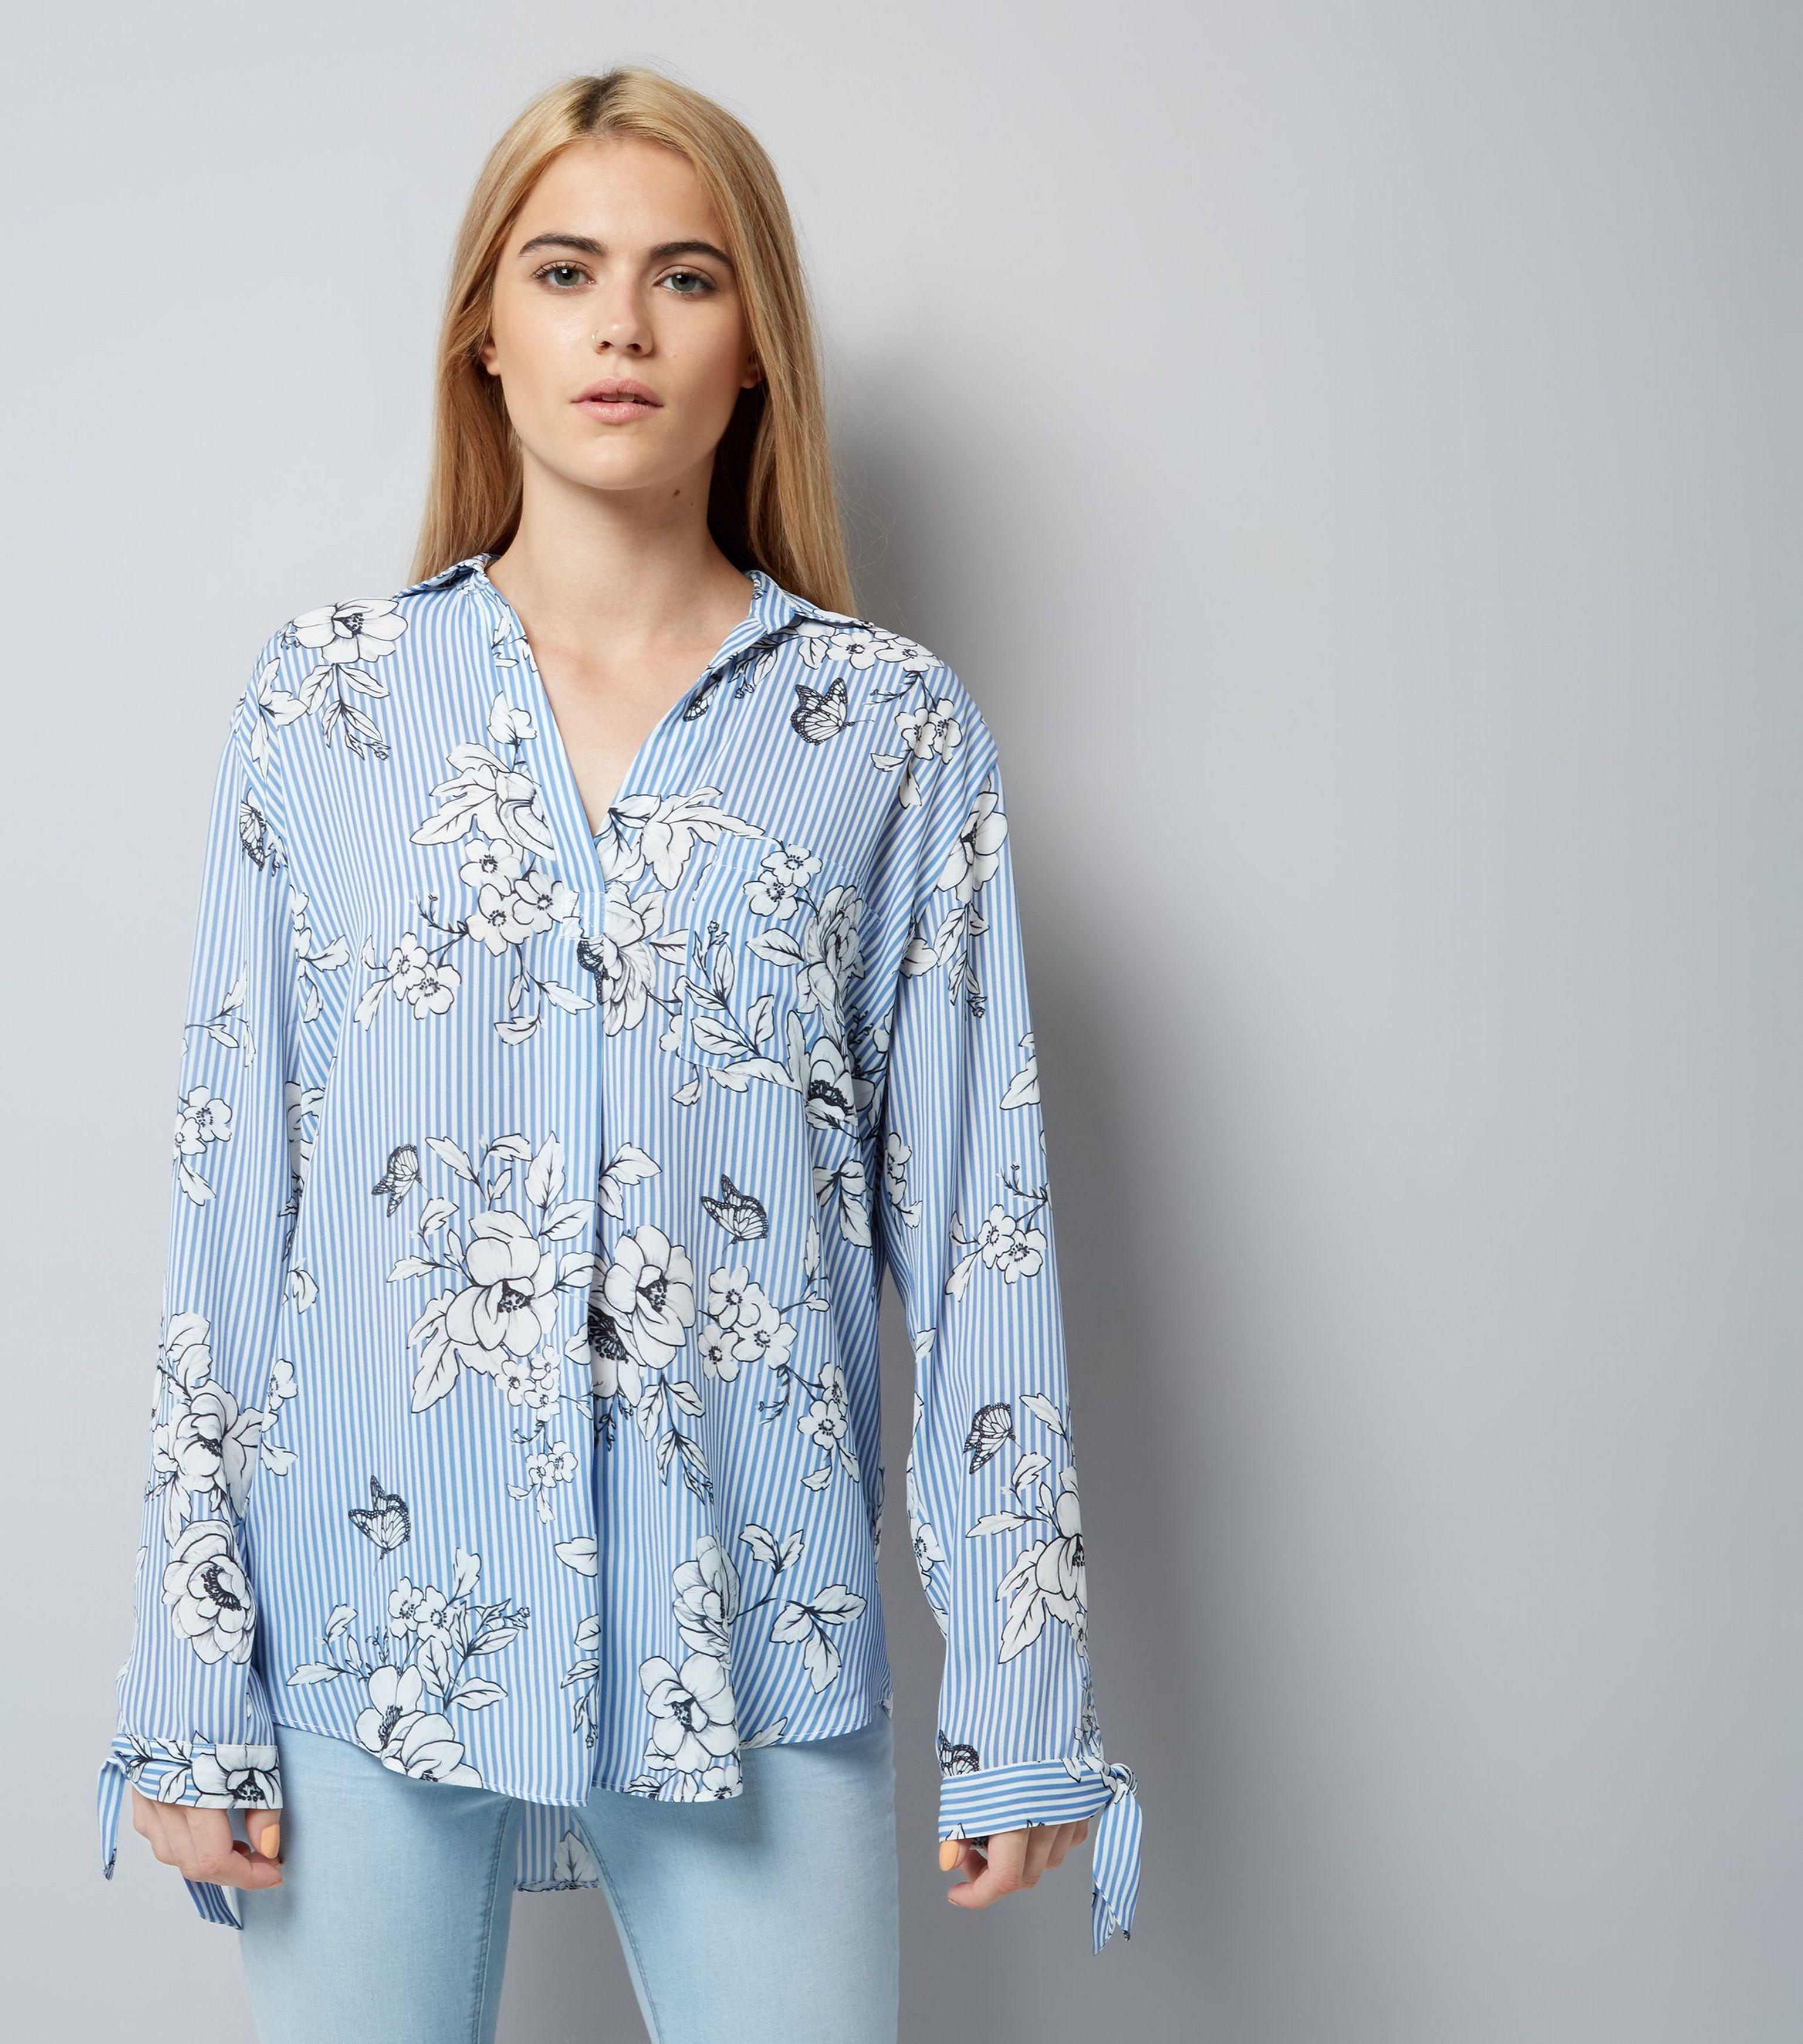 Cheap Online Shop Womens Animal Print Longline Sleeveless Shirt New Look Outlet Store Cheap Online Brand New Unisex For Sale W5skMPNuf